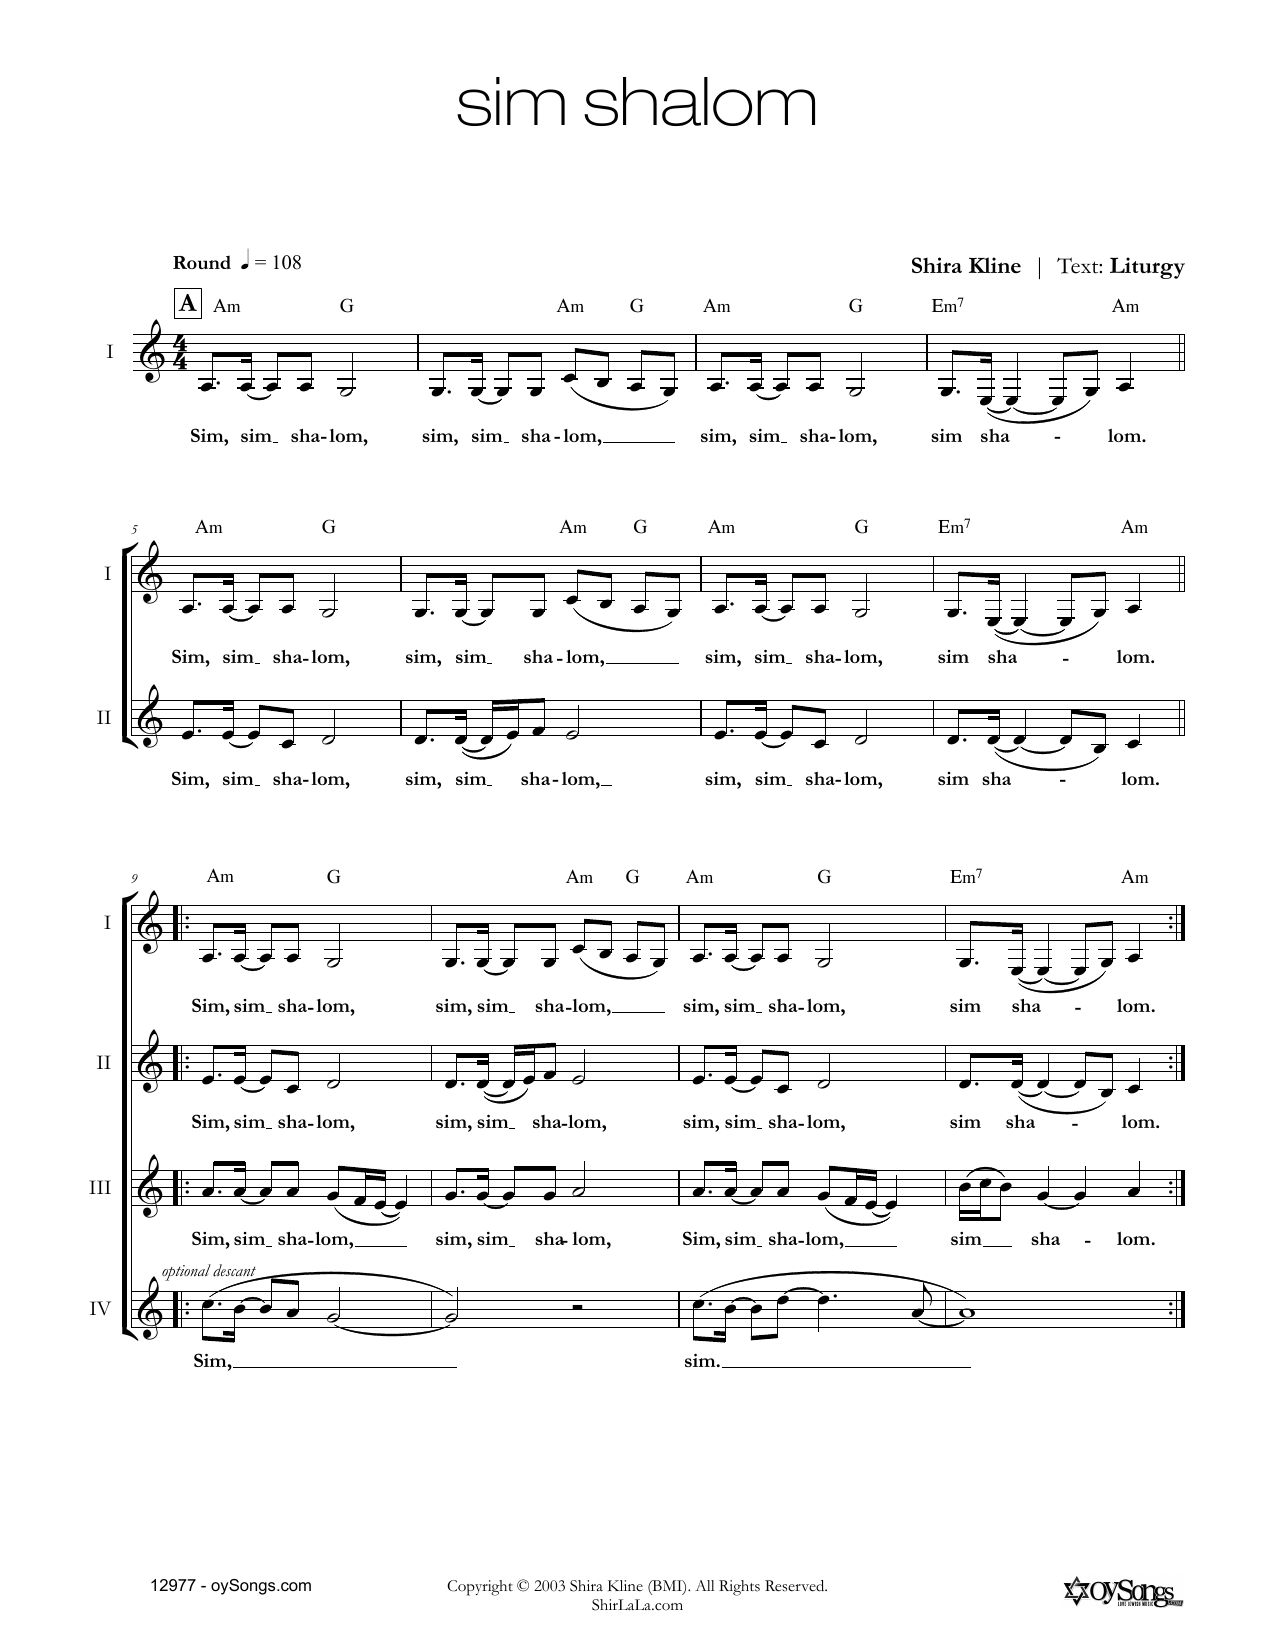 Shira Kline Sim Shalom sheet music notes and chords. Download Printable PDF.